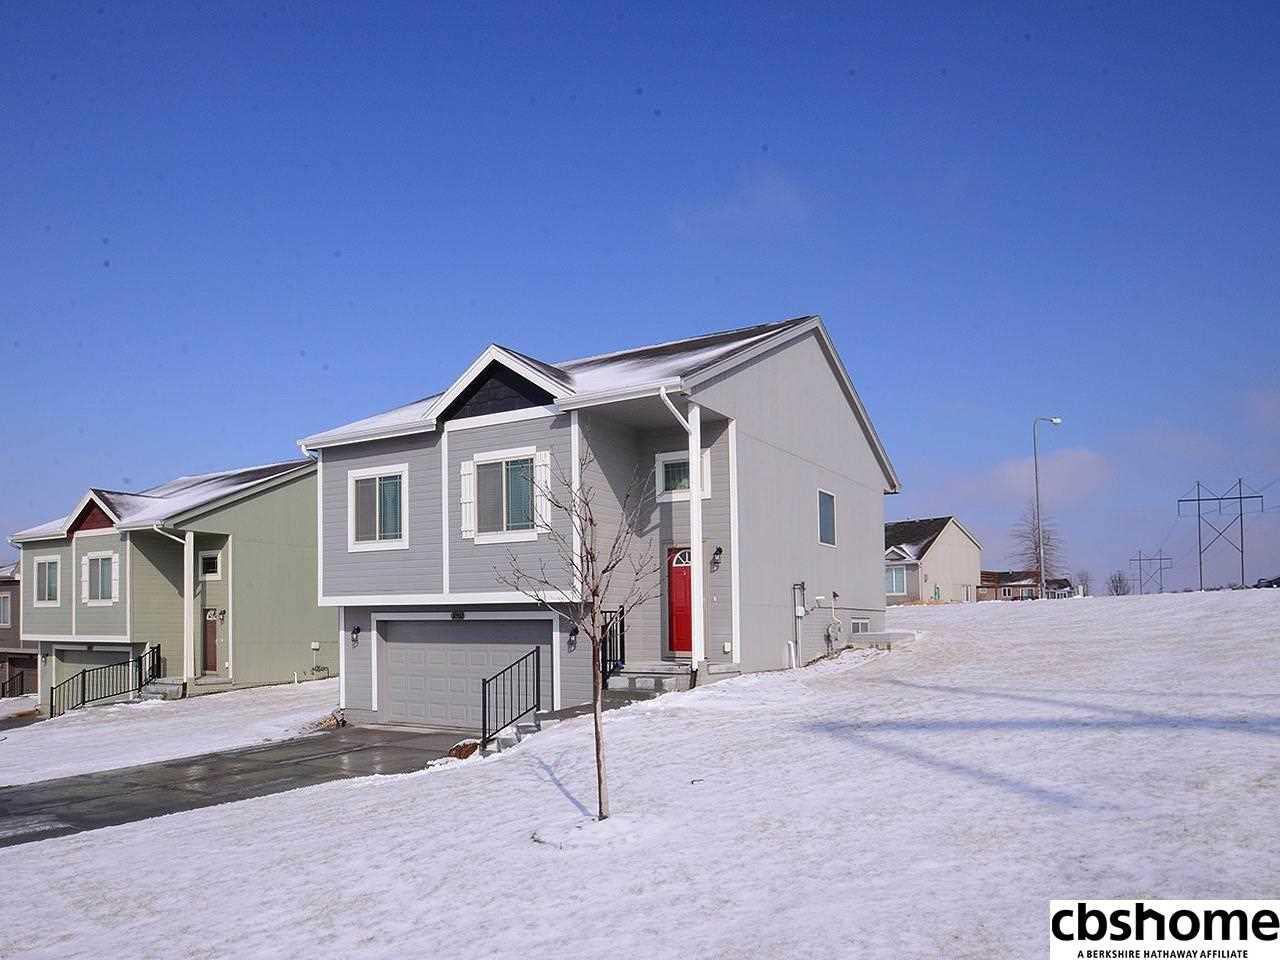 18902 Drexel Omaha, NE 68135 | MLS 21802567 Photo 1